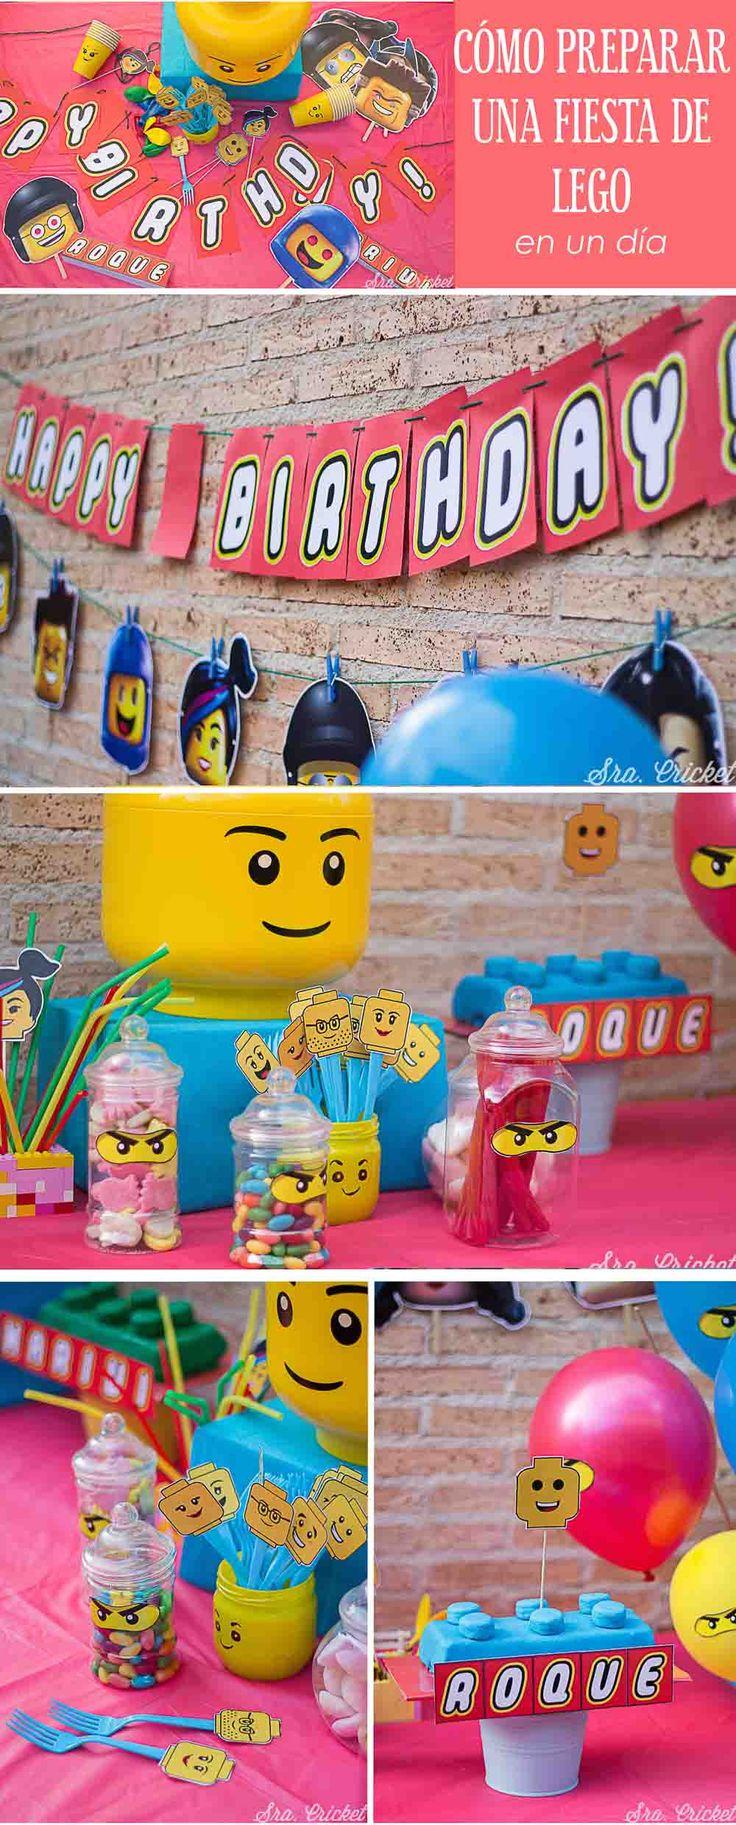 lego party, fiesta lego, imprimibles lego gratis, lego free printable, fiesta infantil de lego, kids party. Fiesta de Lego para niños